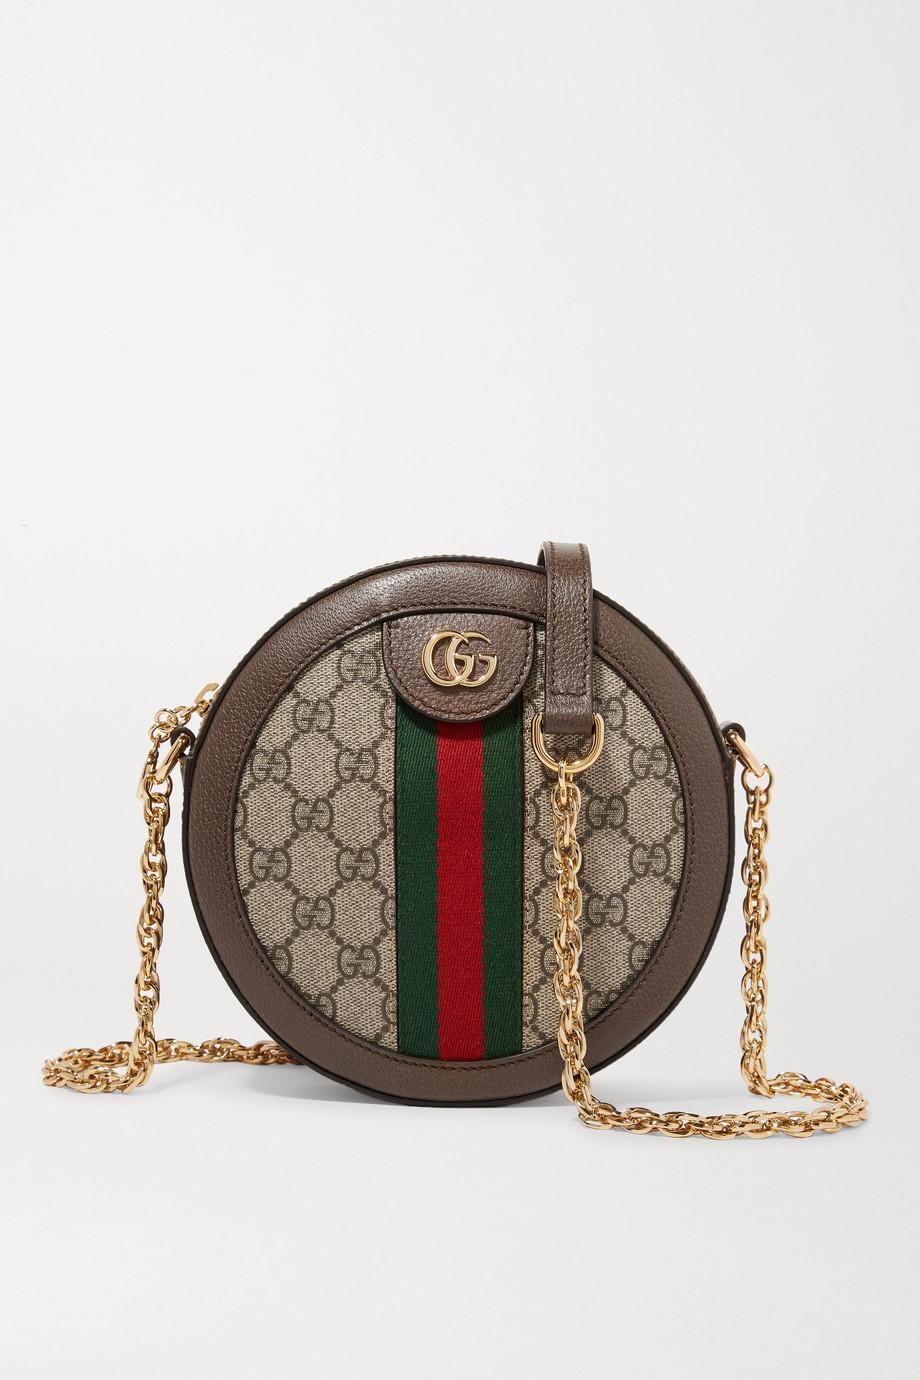 Gucci Ophidia 纹理皮革边饰印花涂层帆布迷你单肩包